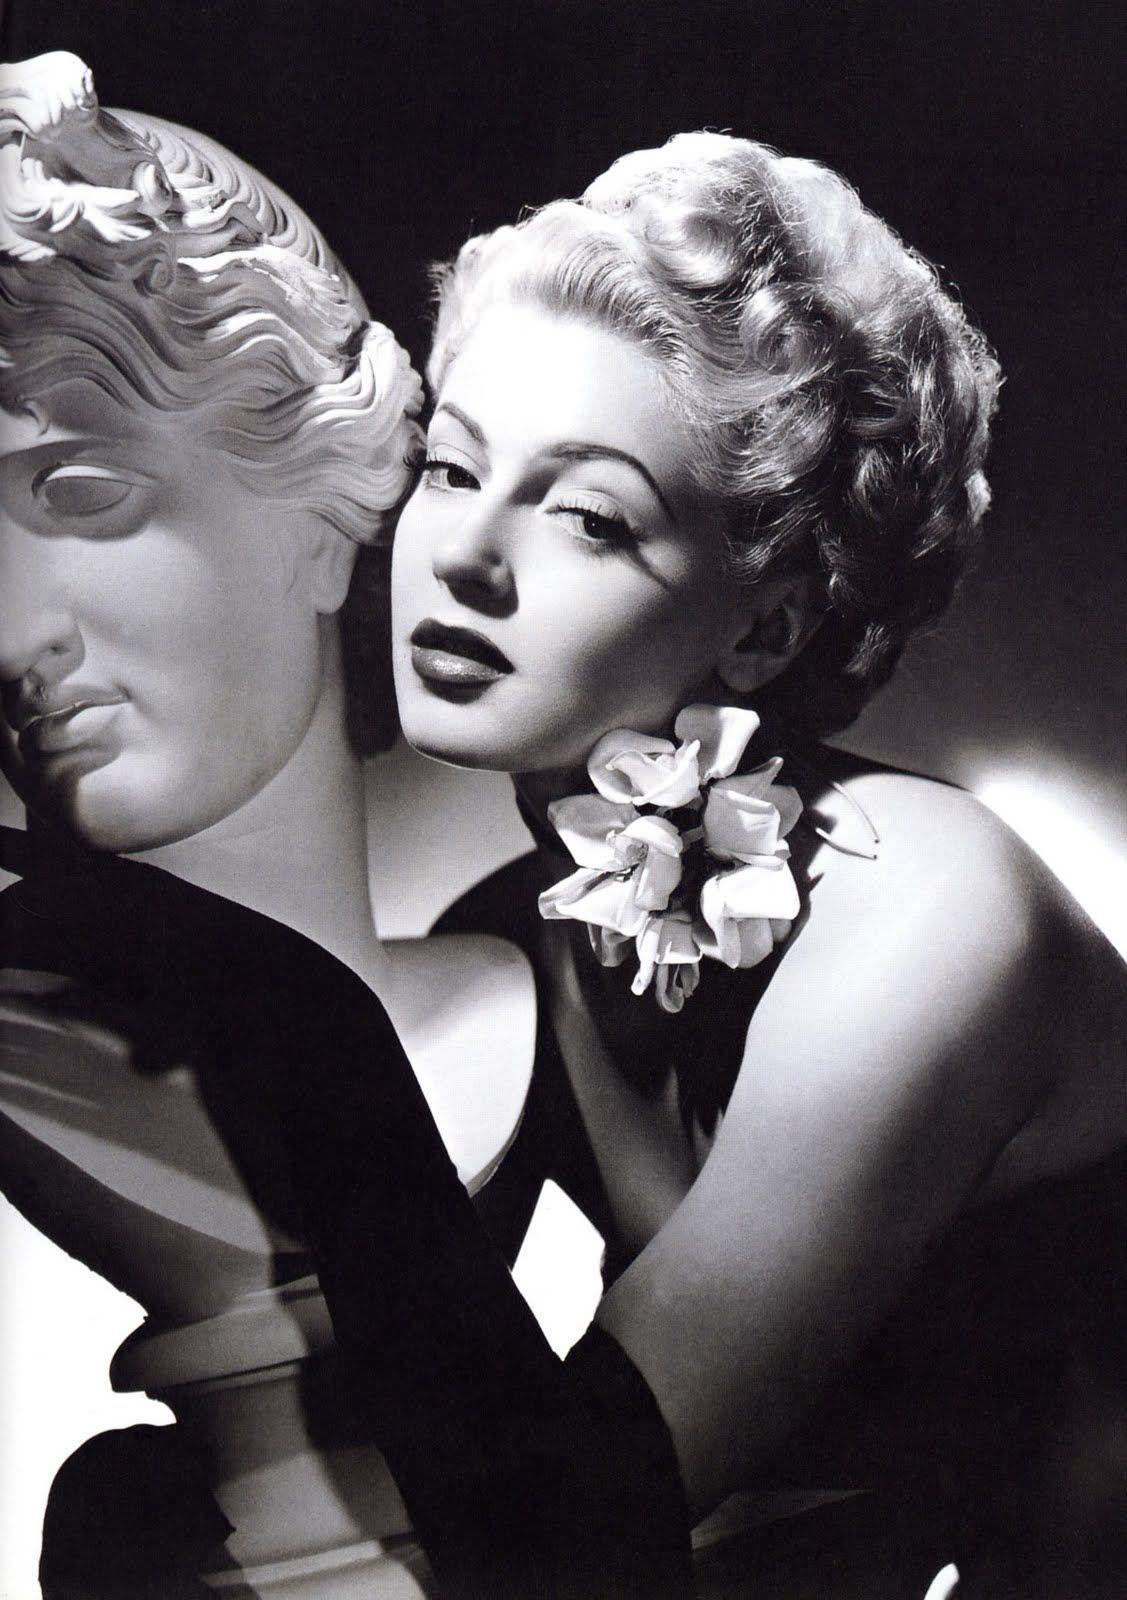 Lana Turner in opera gloves ~ as seen at http://vintagefilmpropsandcostumes.blogspot.com/2011/02/lana-turner-glamour-girl.html